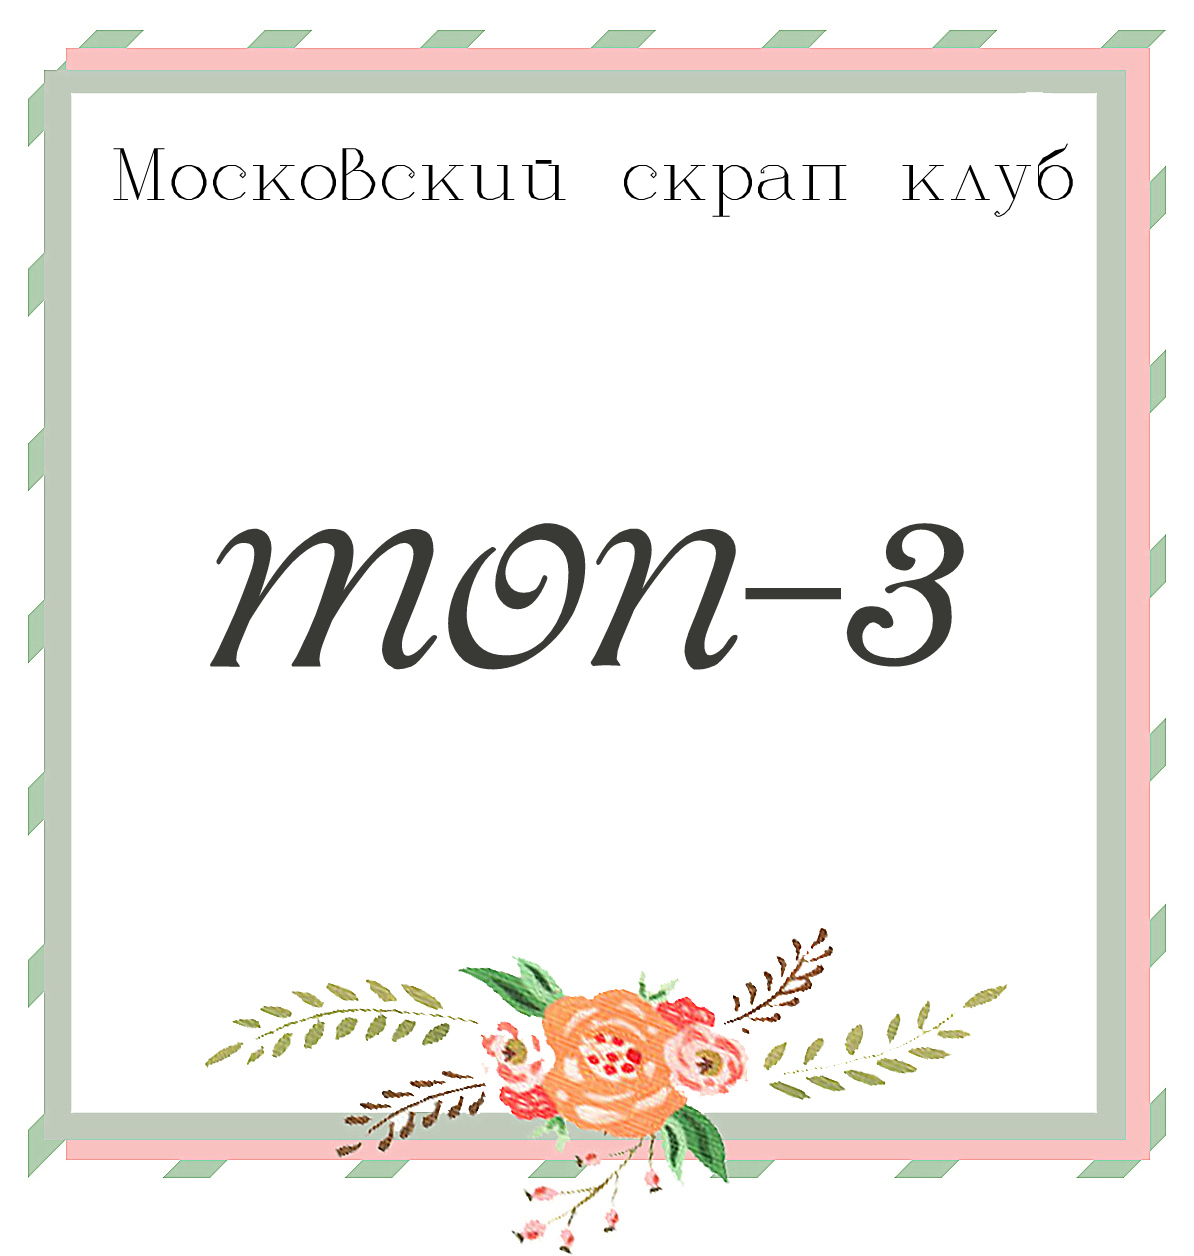 Открытка 2 i 20